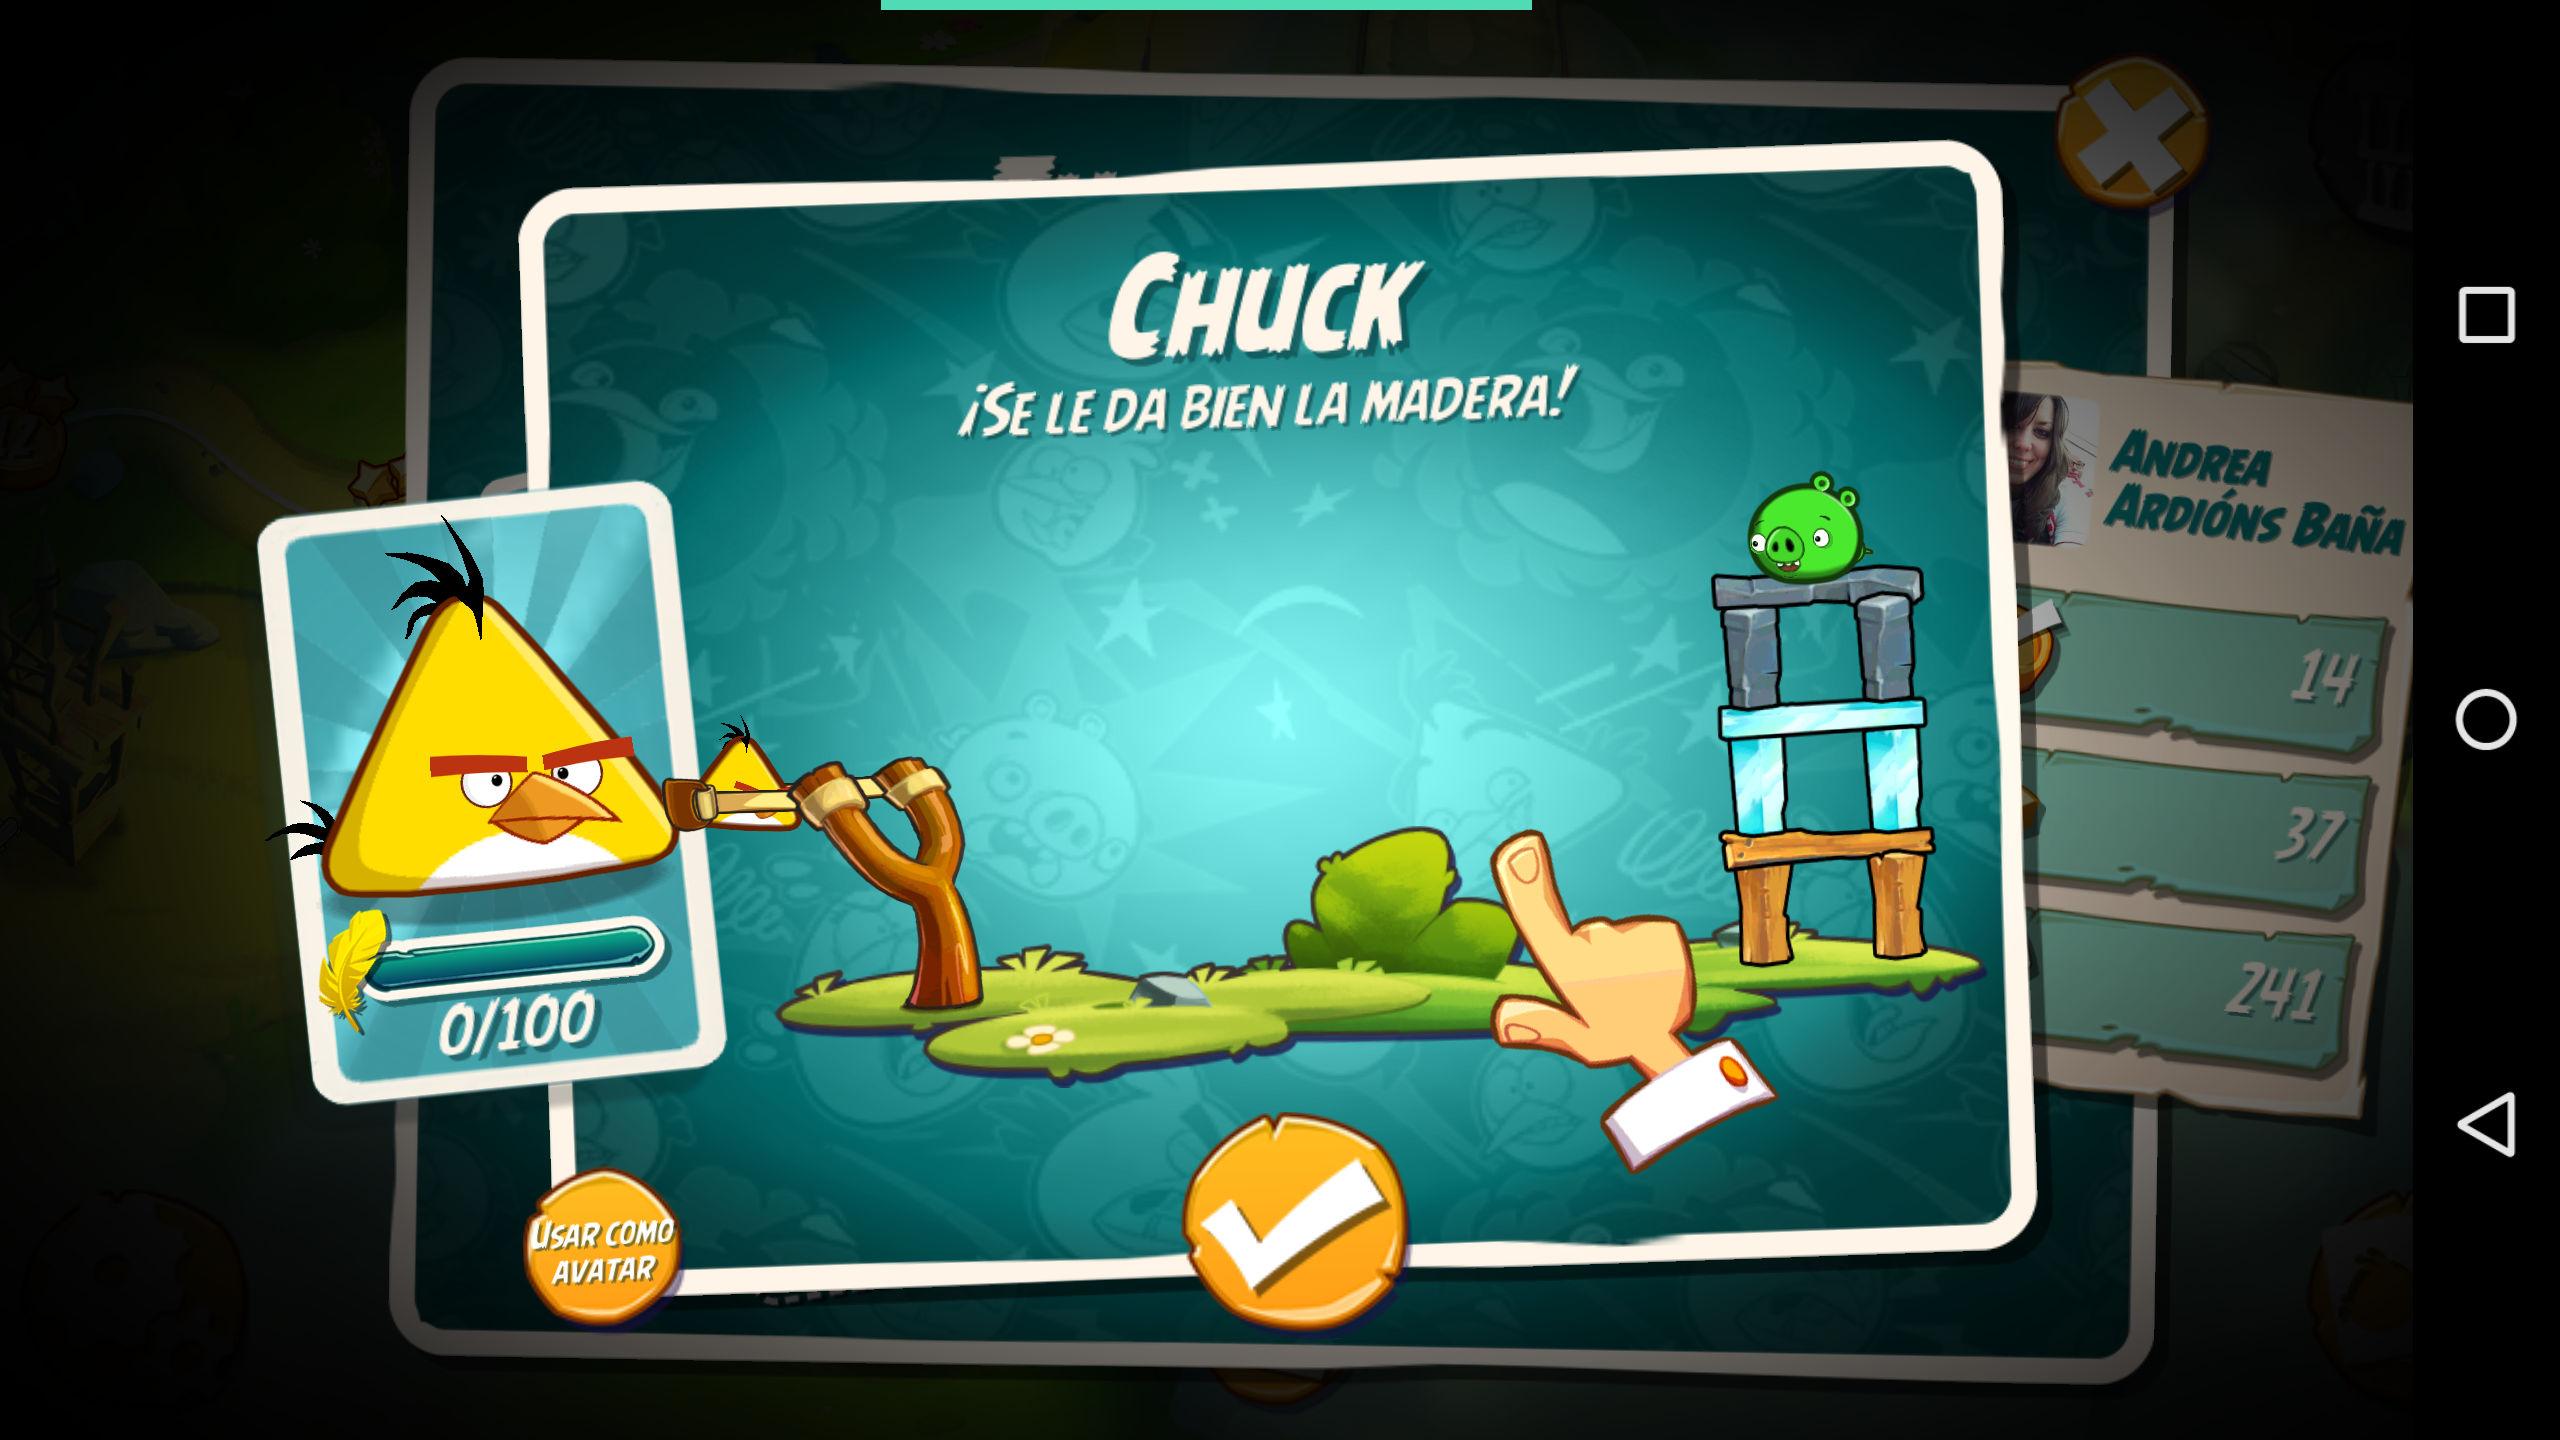 angry-birds-2-chuck